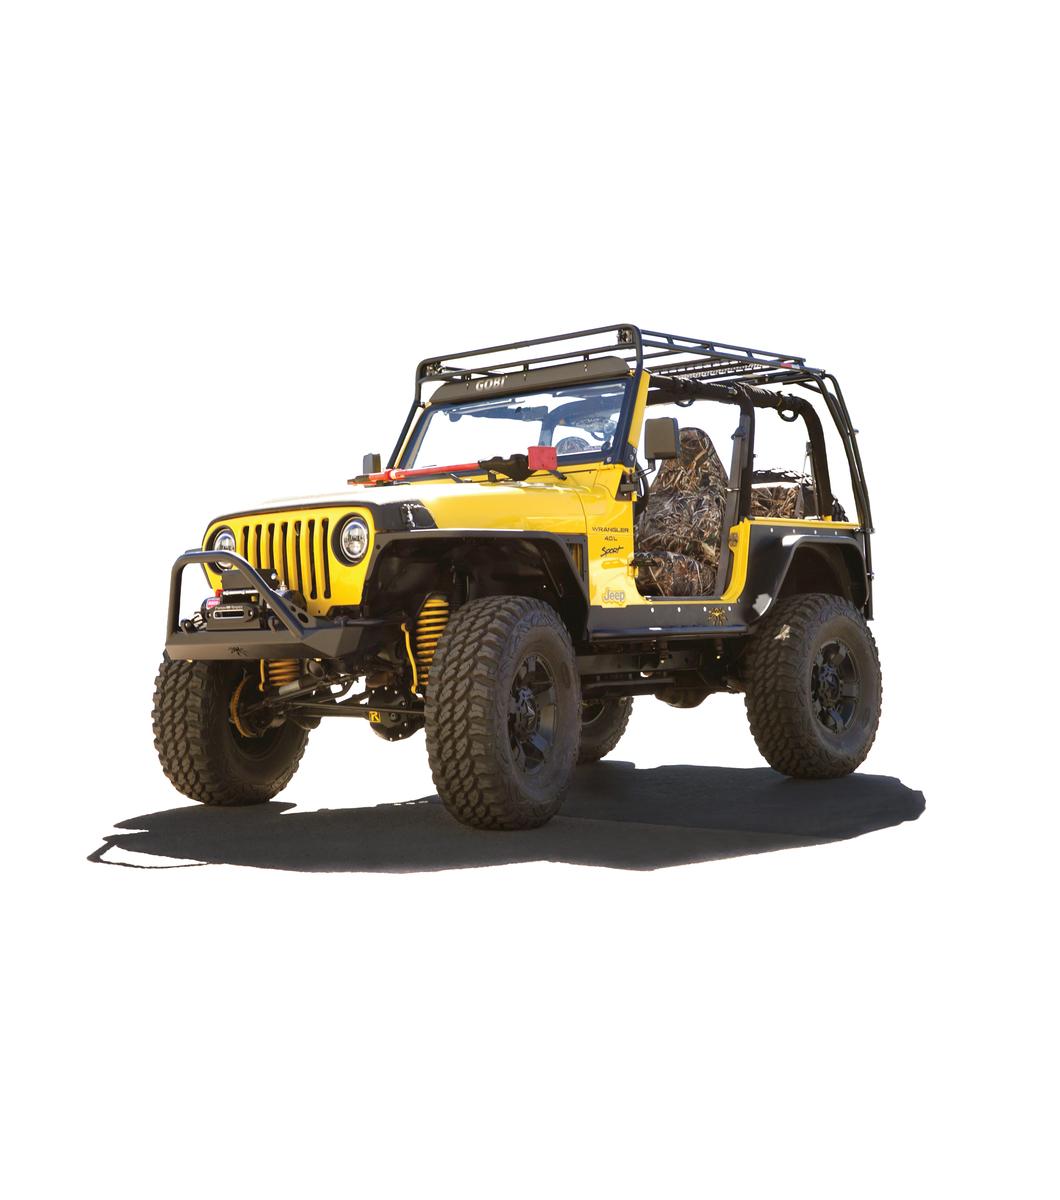 Gobi Jeep Tj Stealth Rack Lightbar Setup With Sunroof